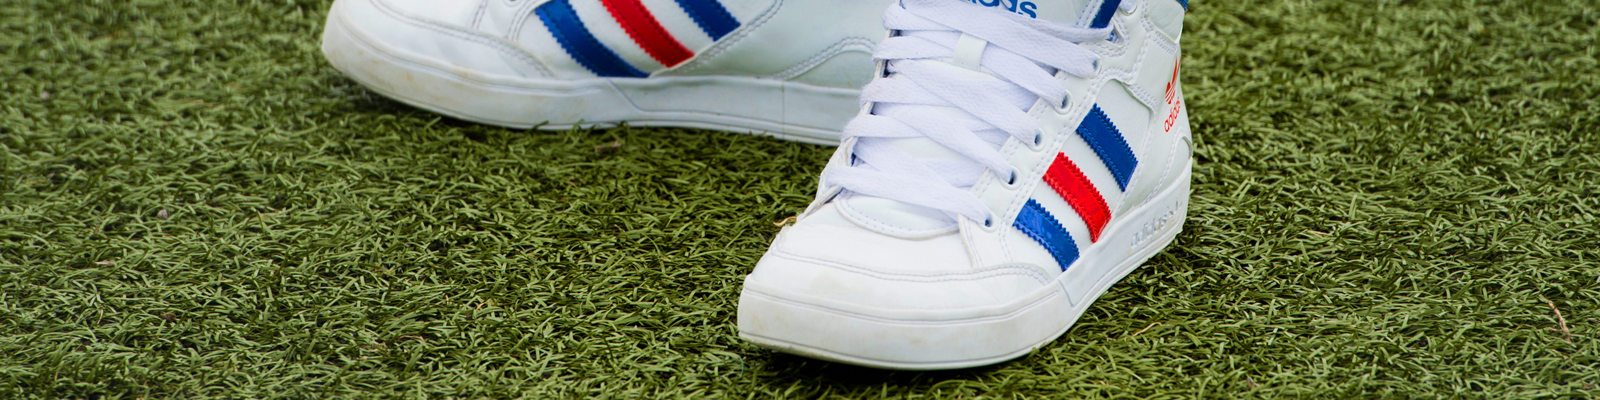 Adidas Turnschuhe.